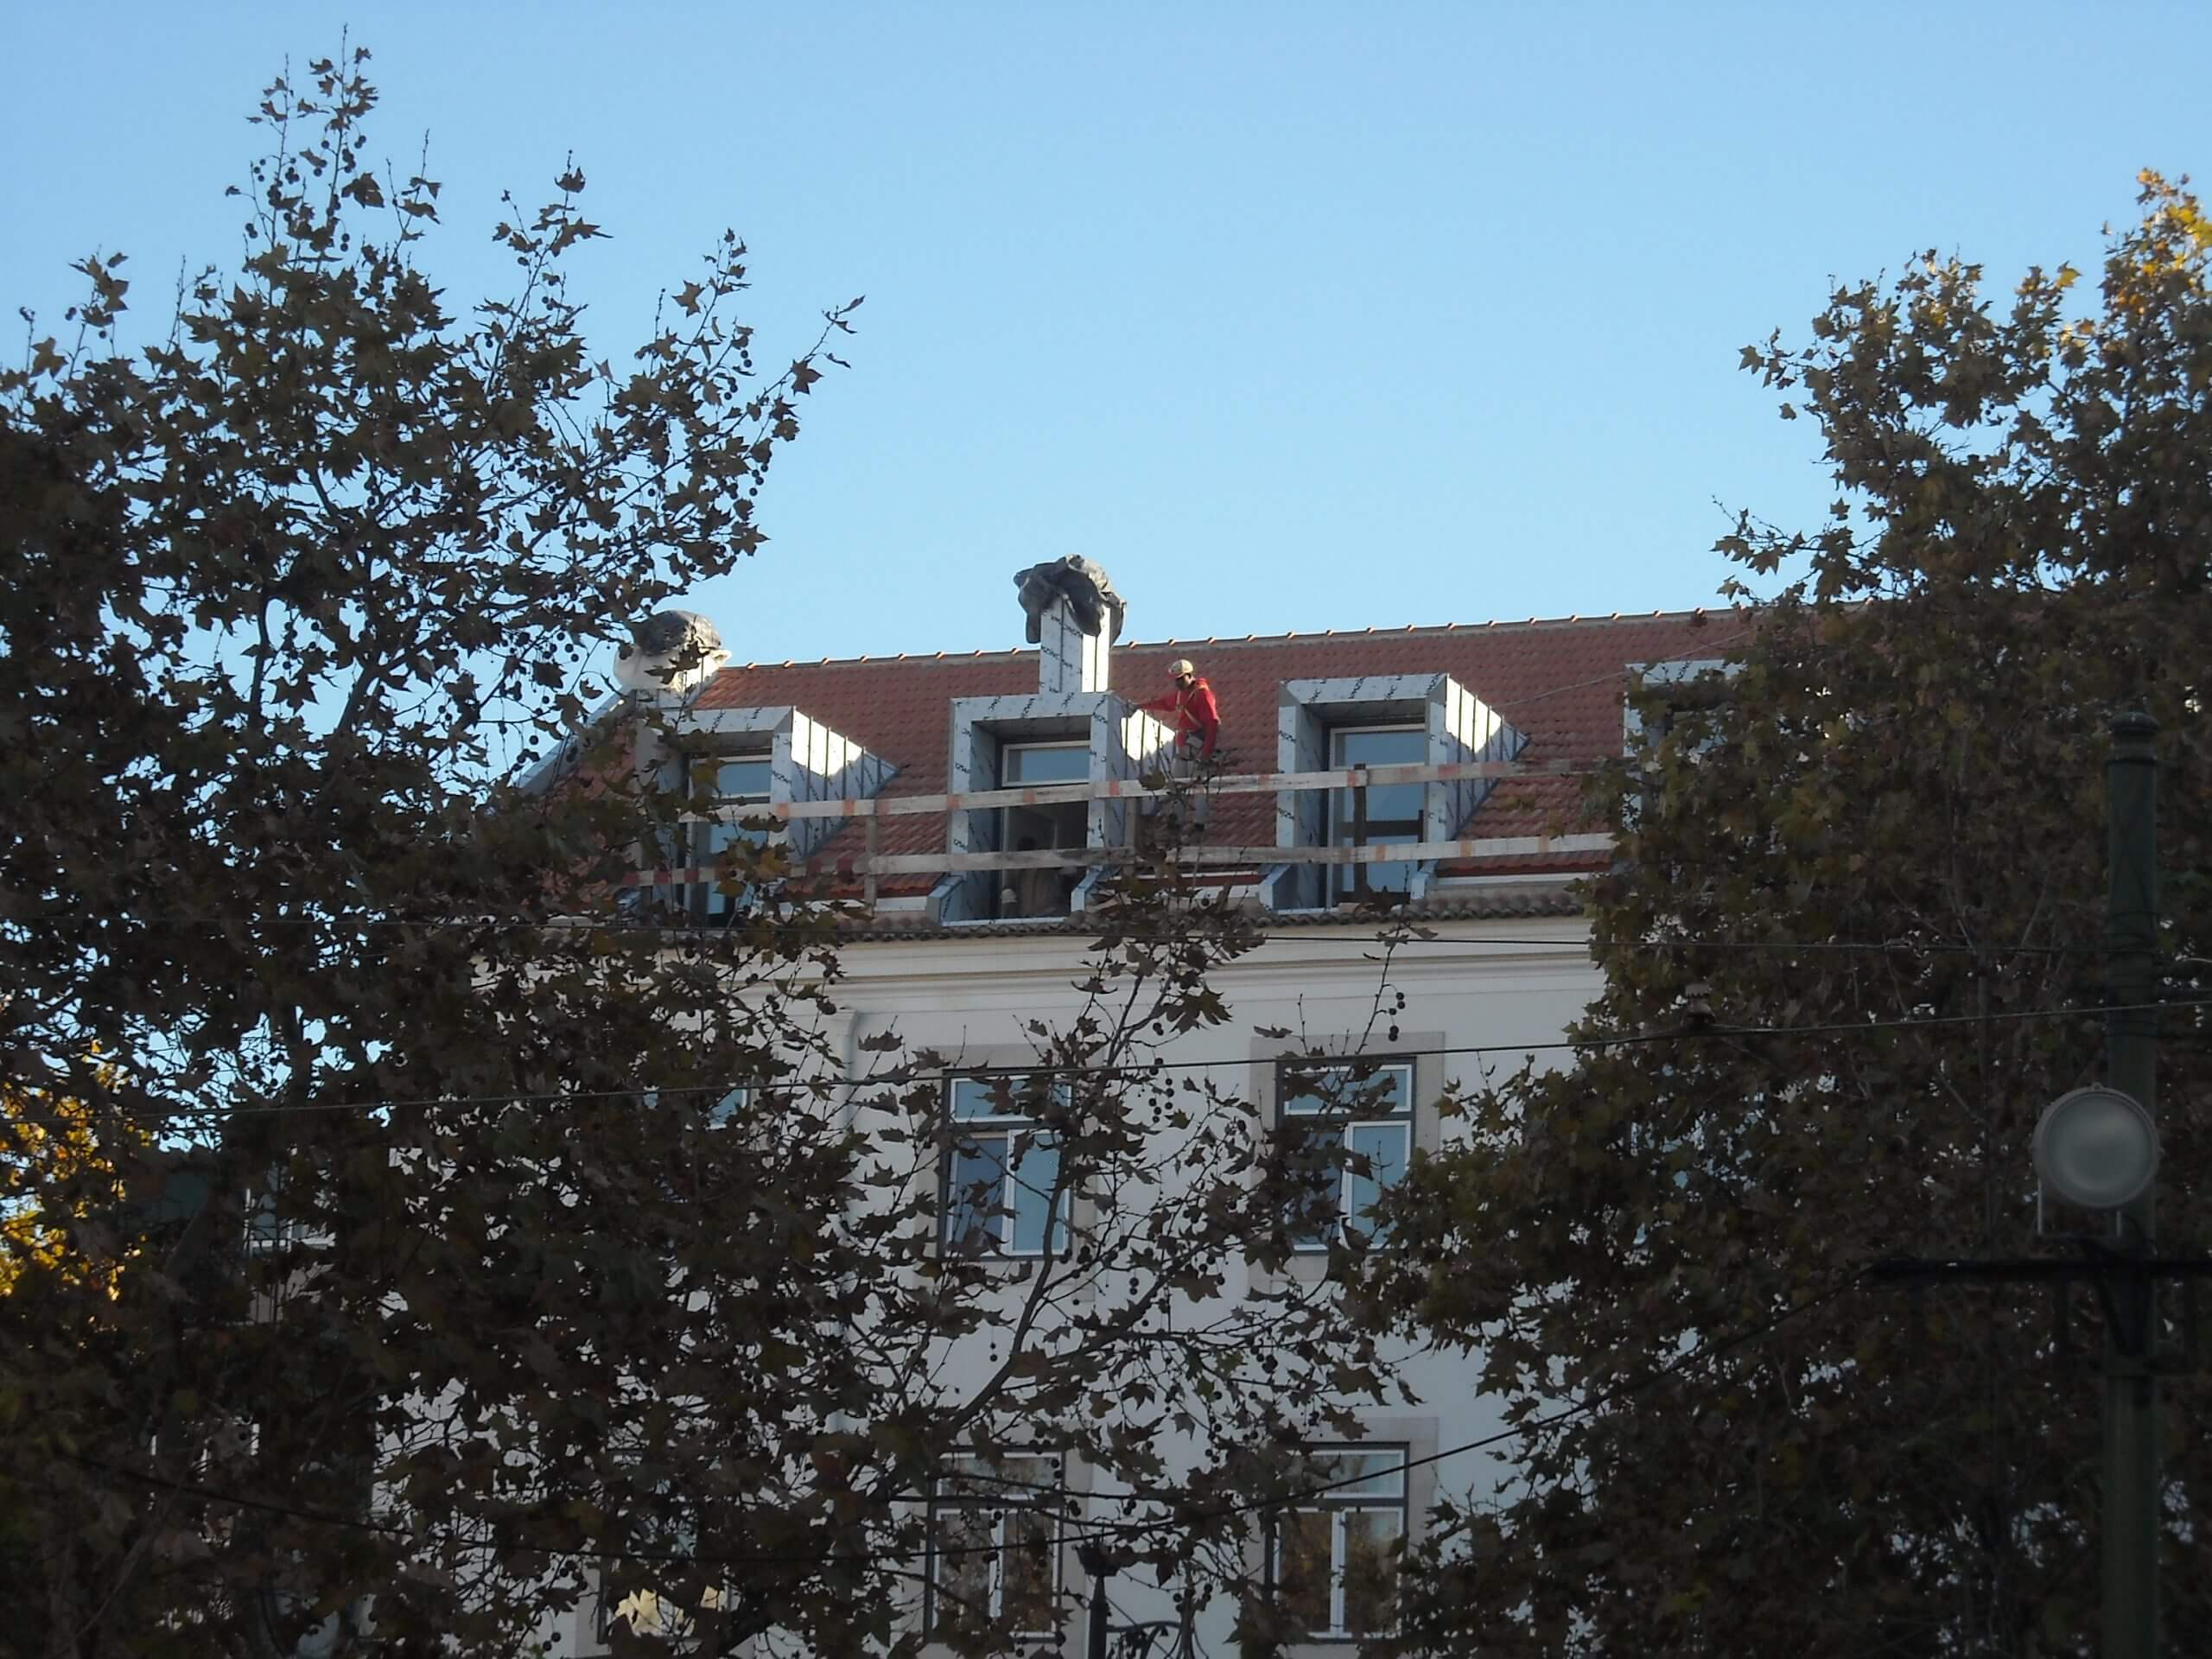 32-Chiado-largo-trindade-coelho-Edificio-multi-familiar-JFonseca-Coordenaá∆o-de-seguranáa-em-obra